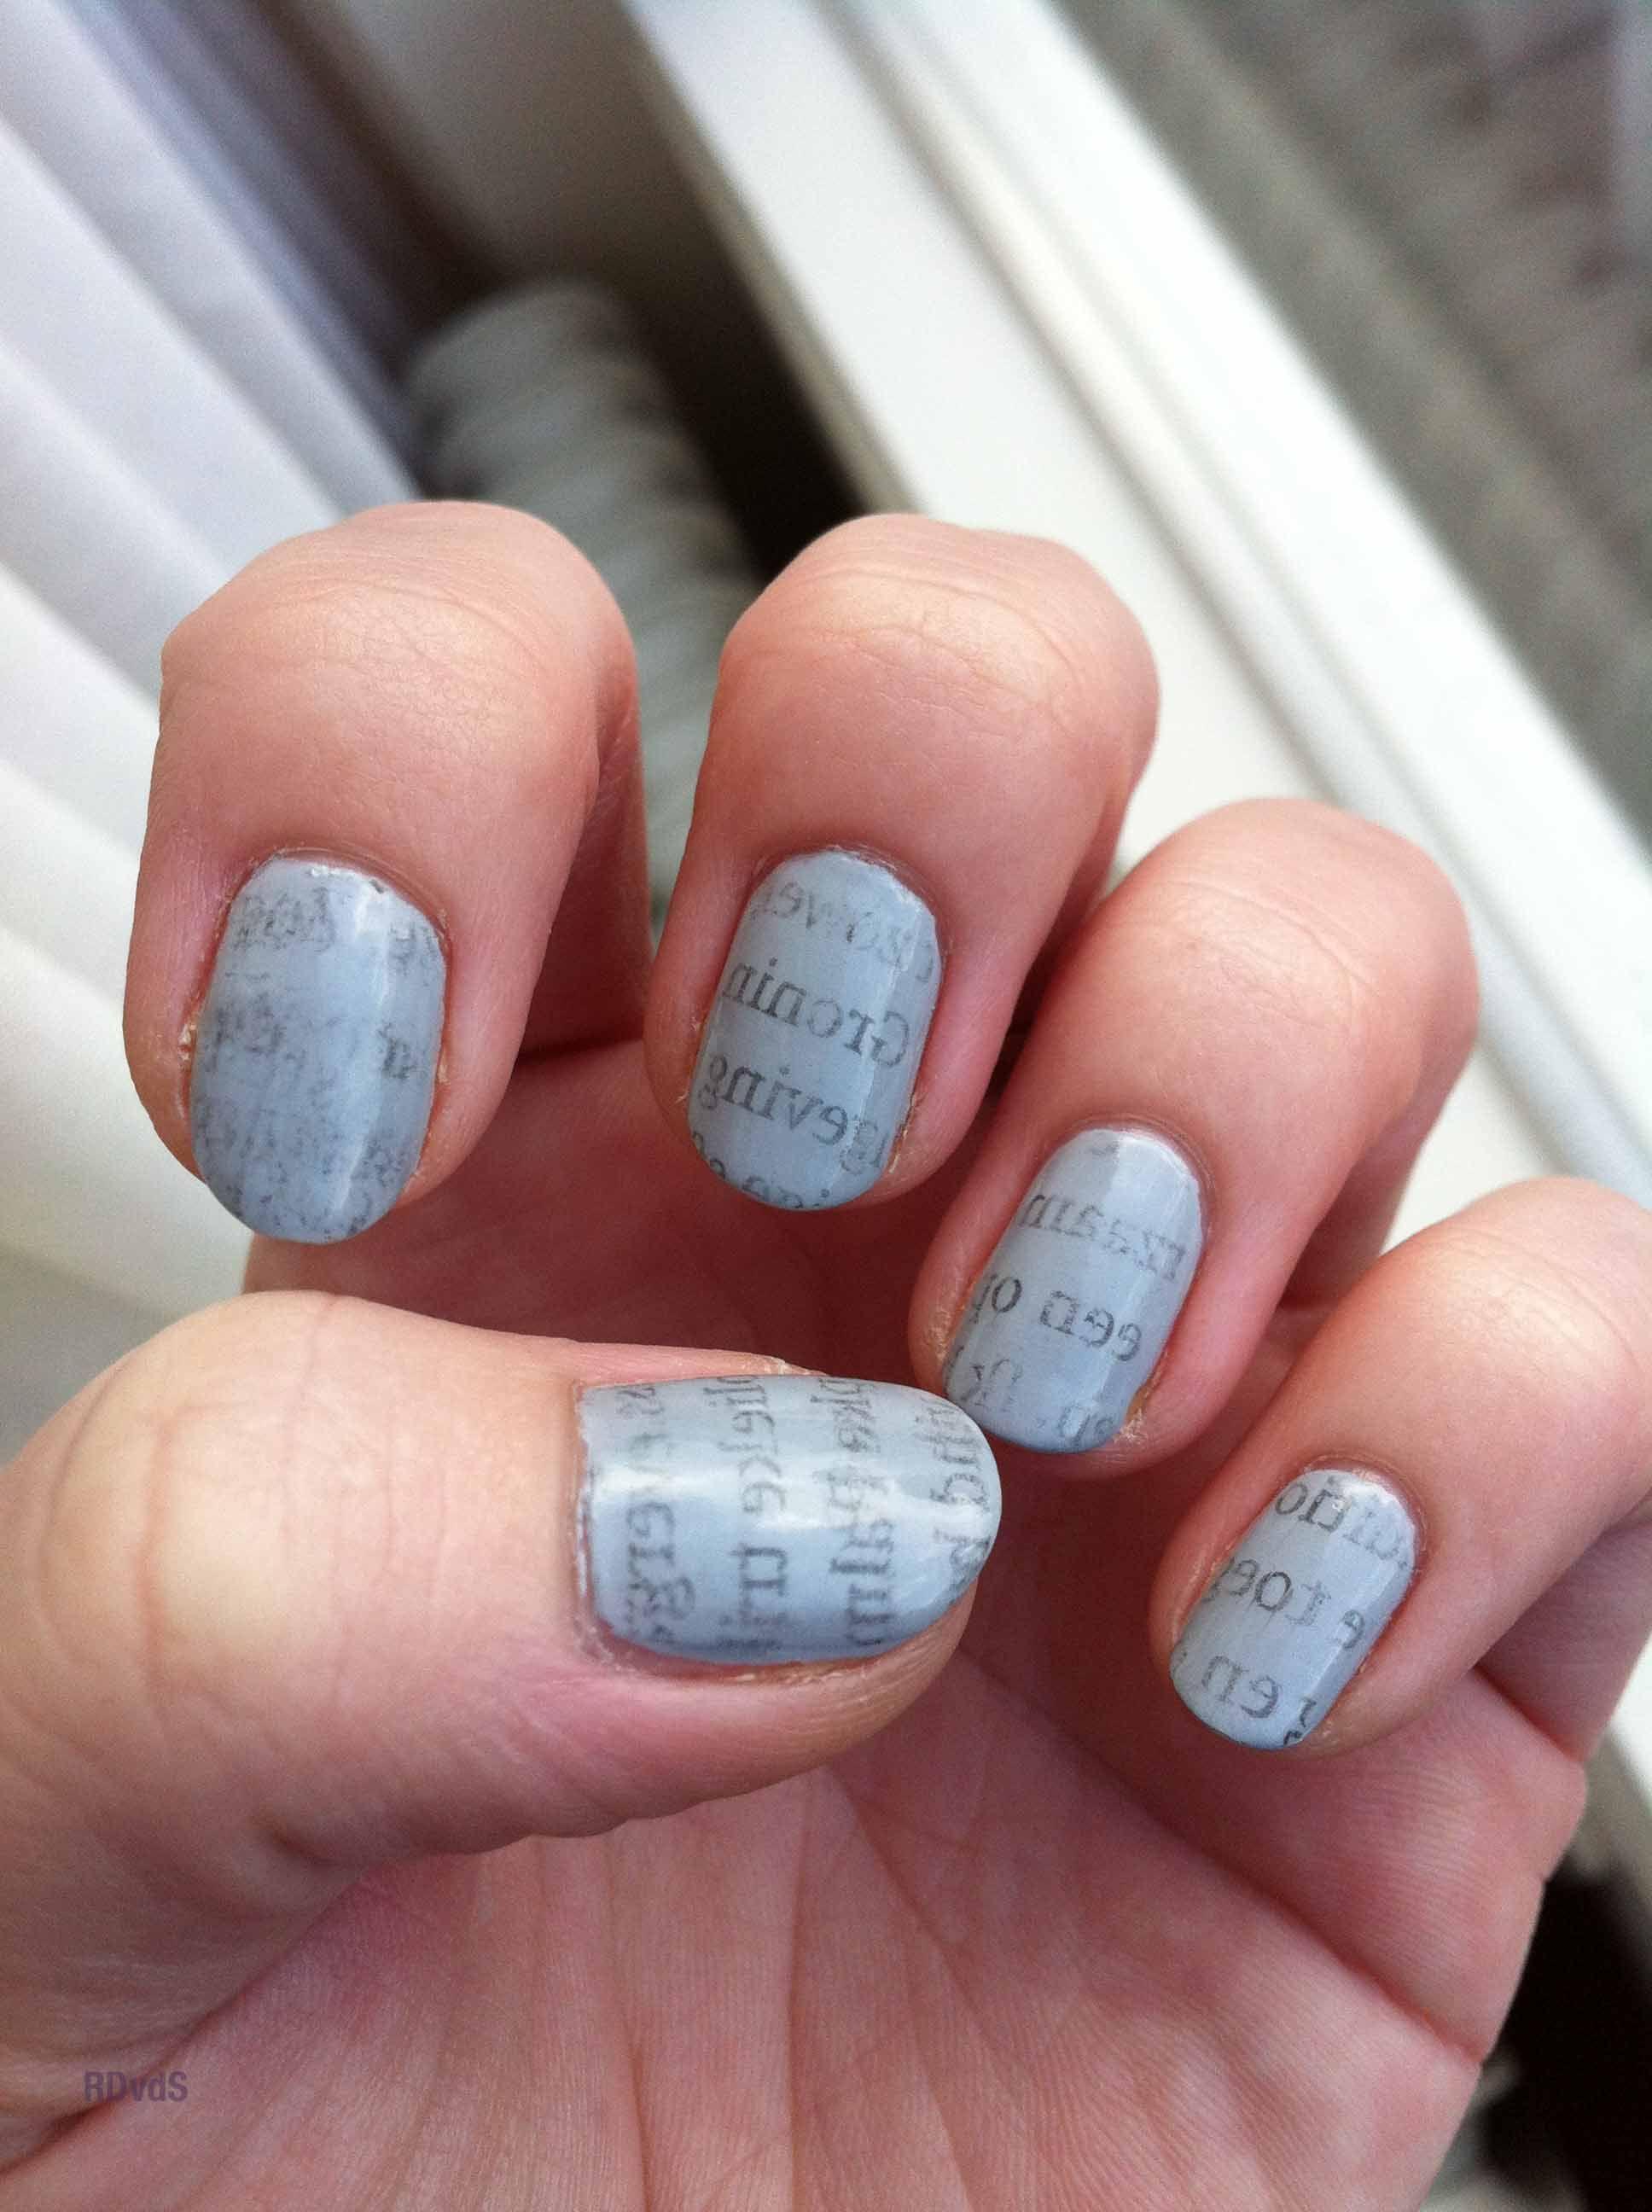 newspaper nail-art | RDvdS-nails | Pinterest | Newspaper nail art ...